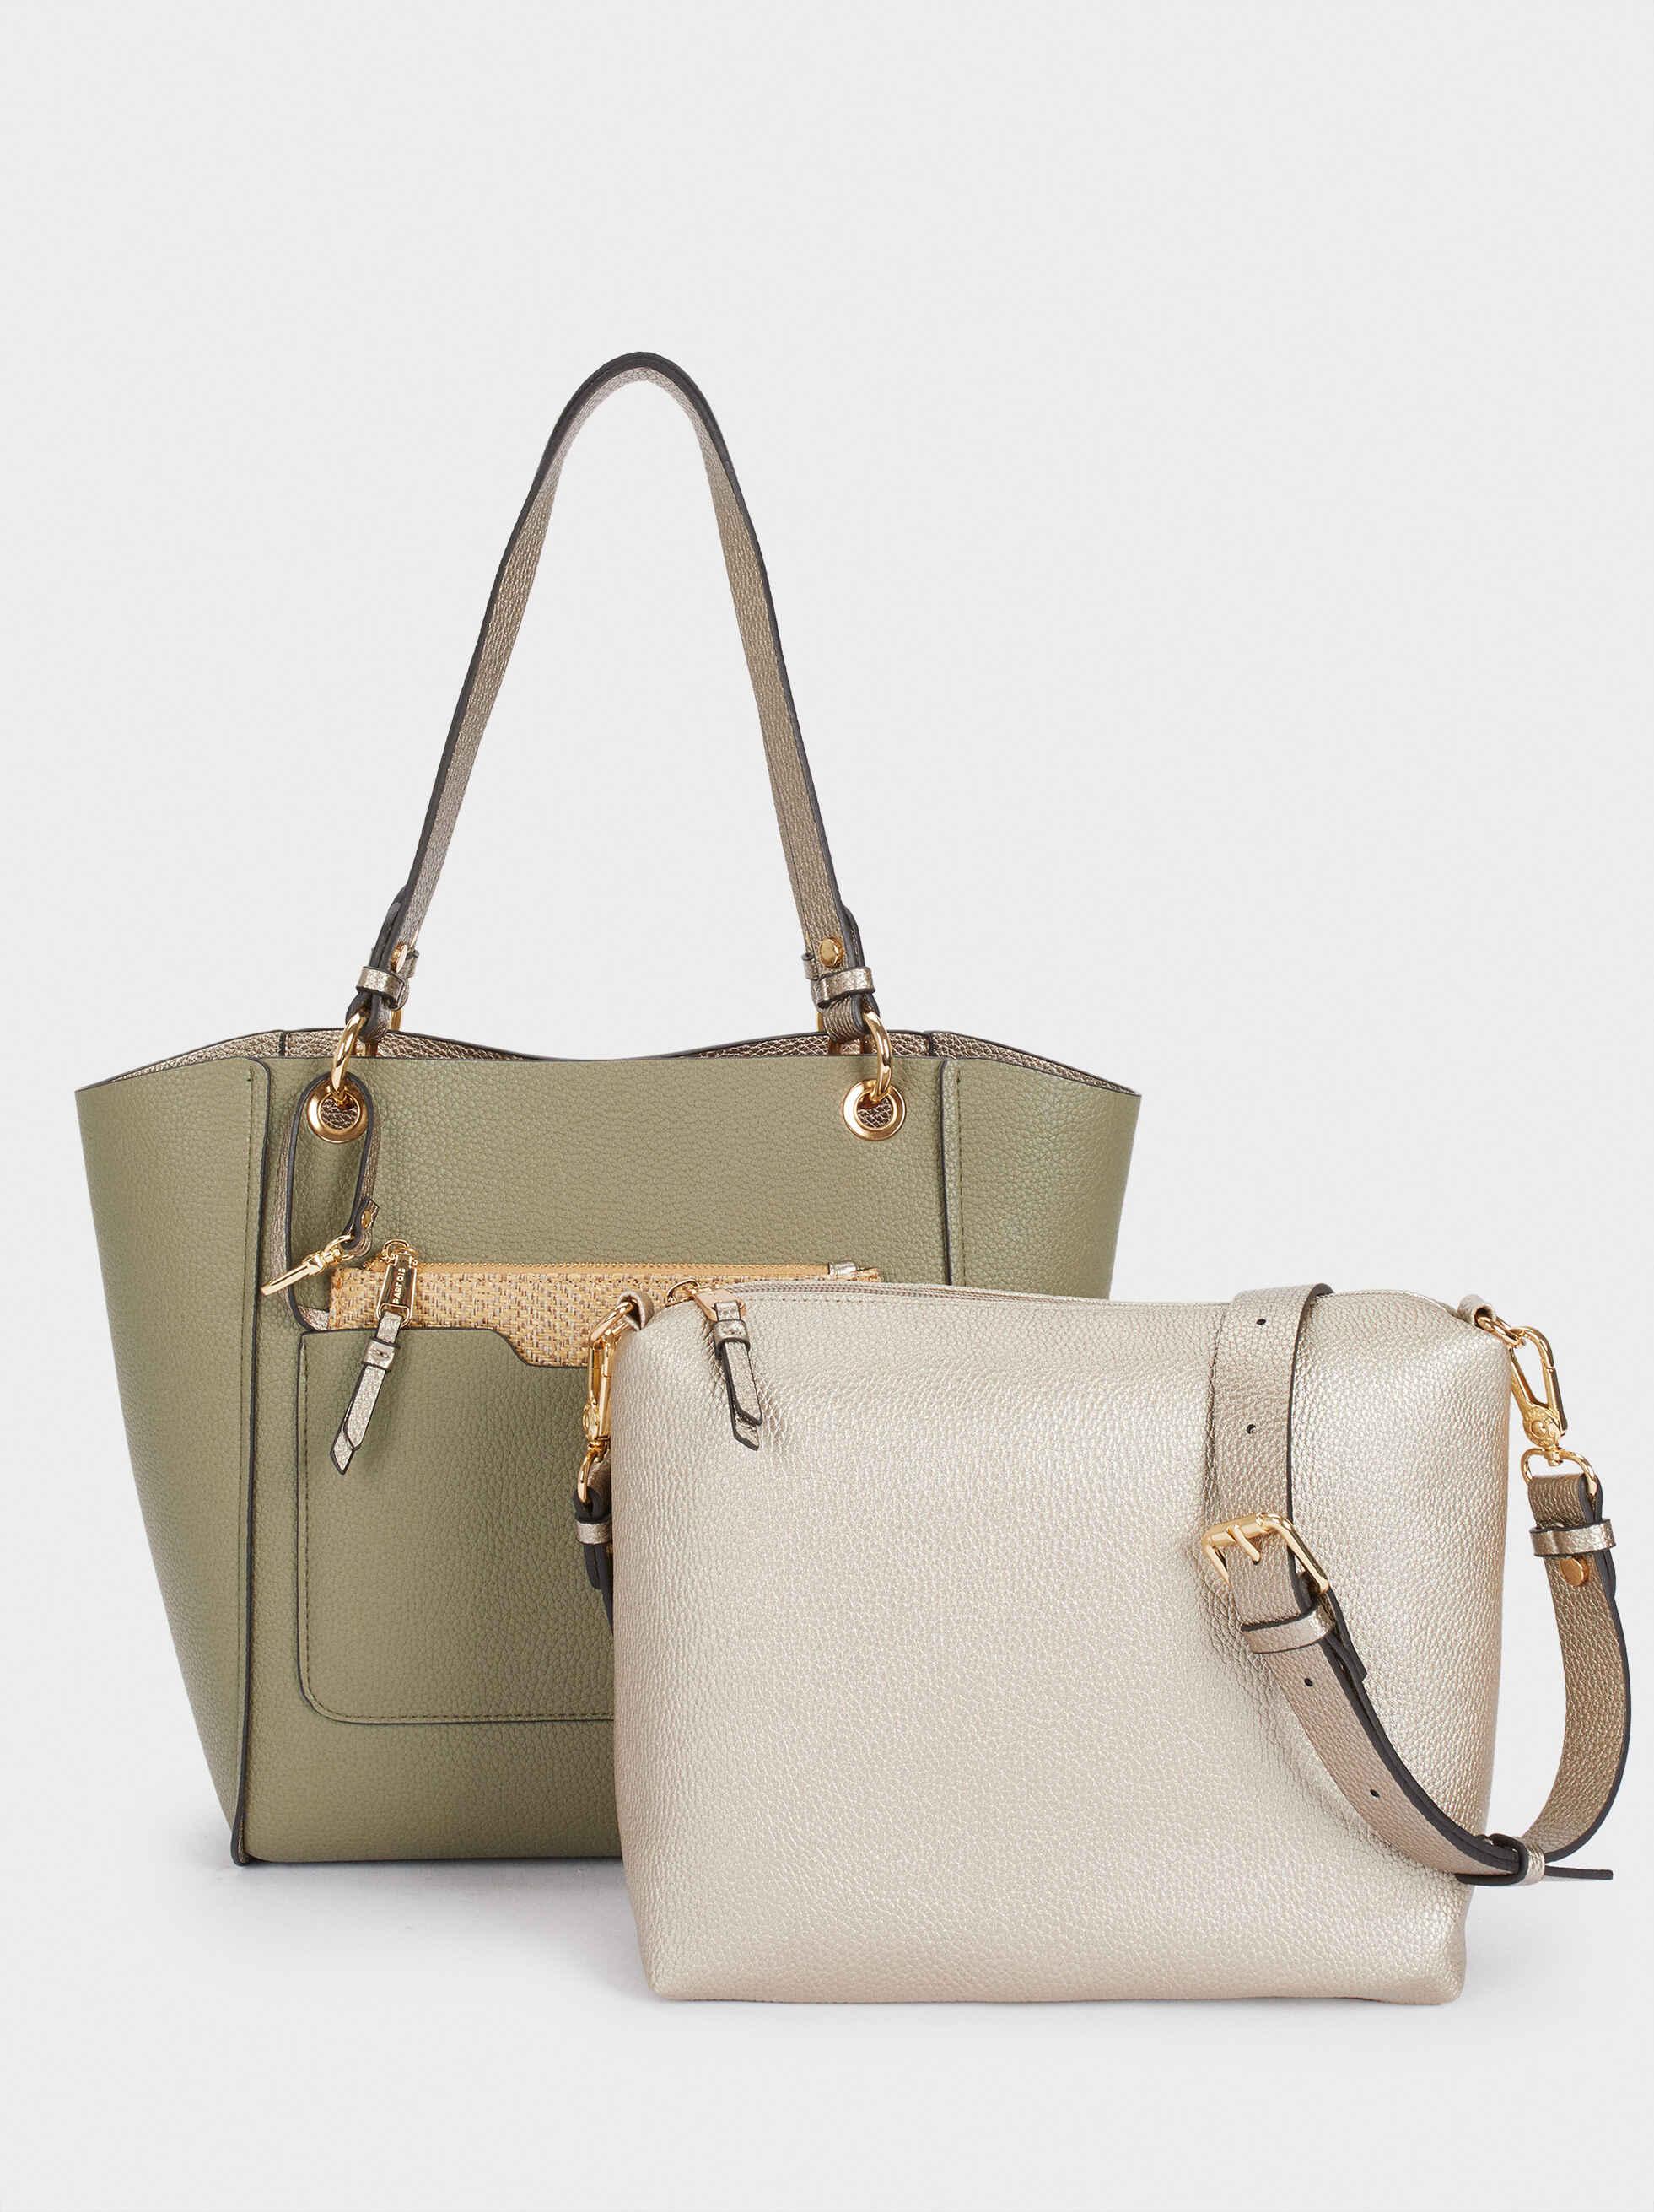 Bolso Shopper Reversible Con Interior Extraible - Negro - Mujer - Shoppers - parfois.com